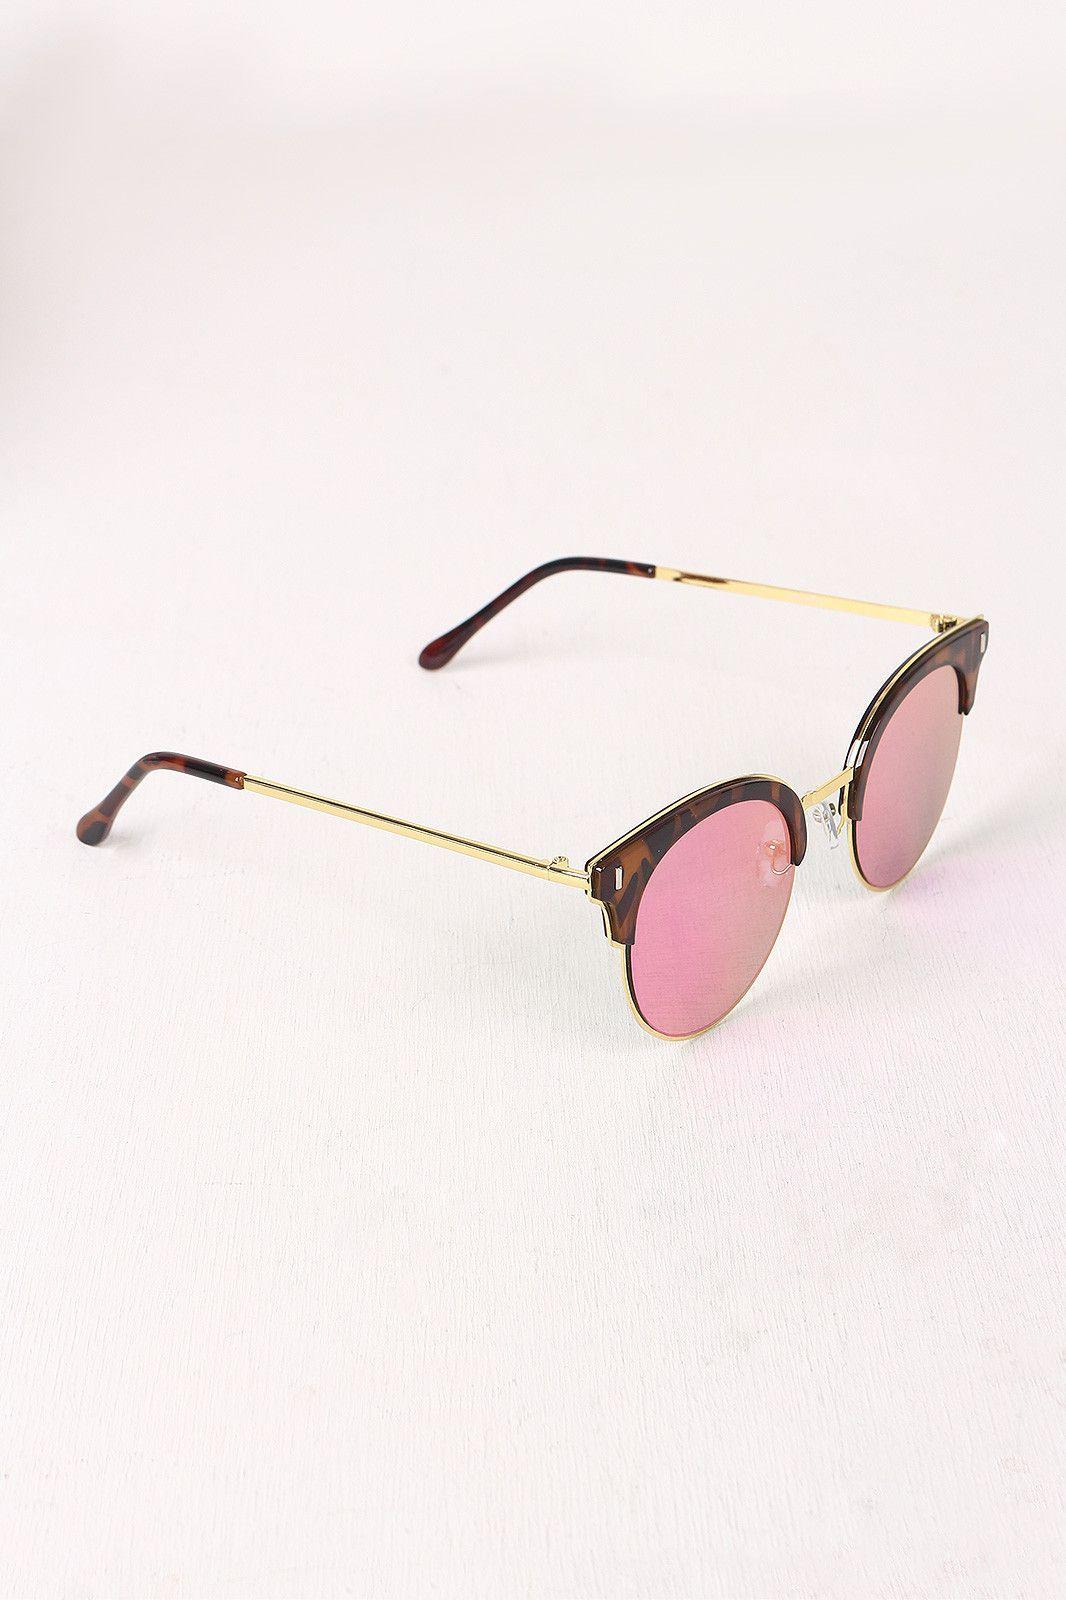 60106aaed4 Round Clubmaster Sunglasses